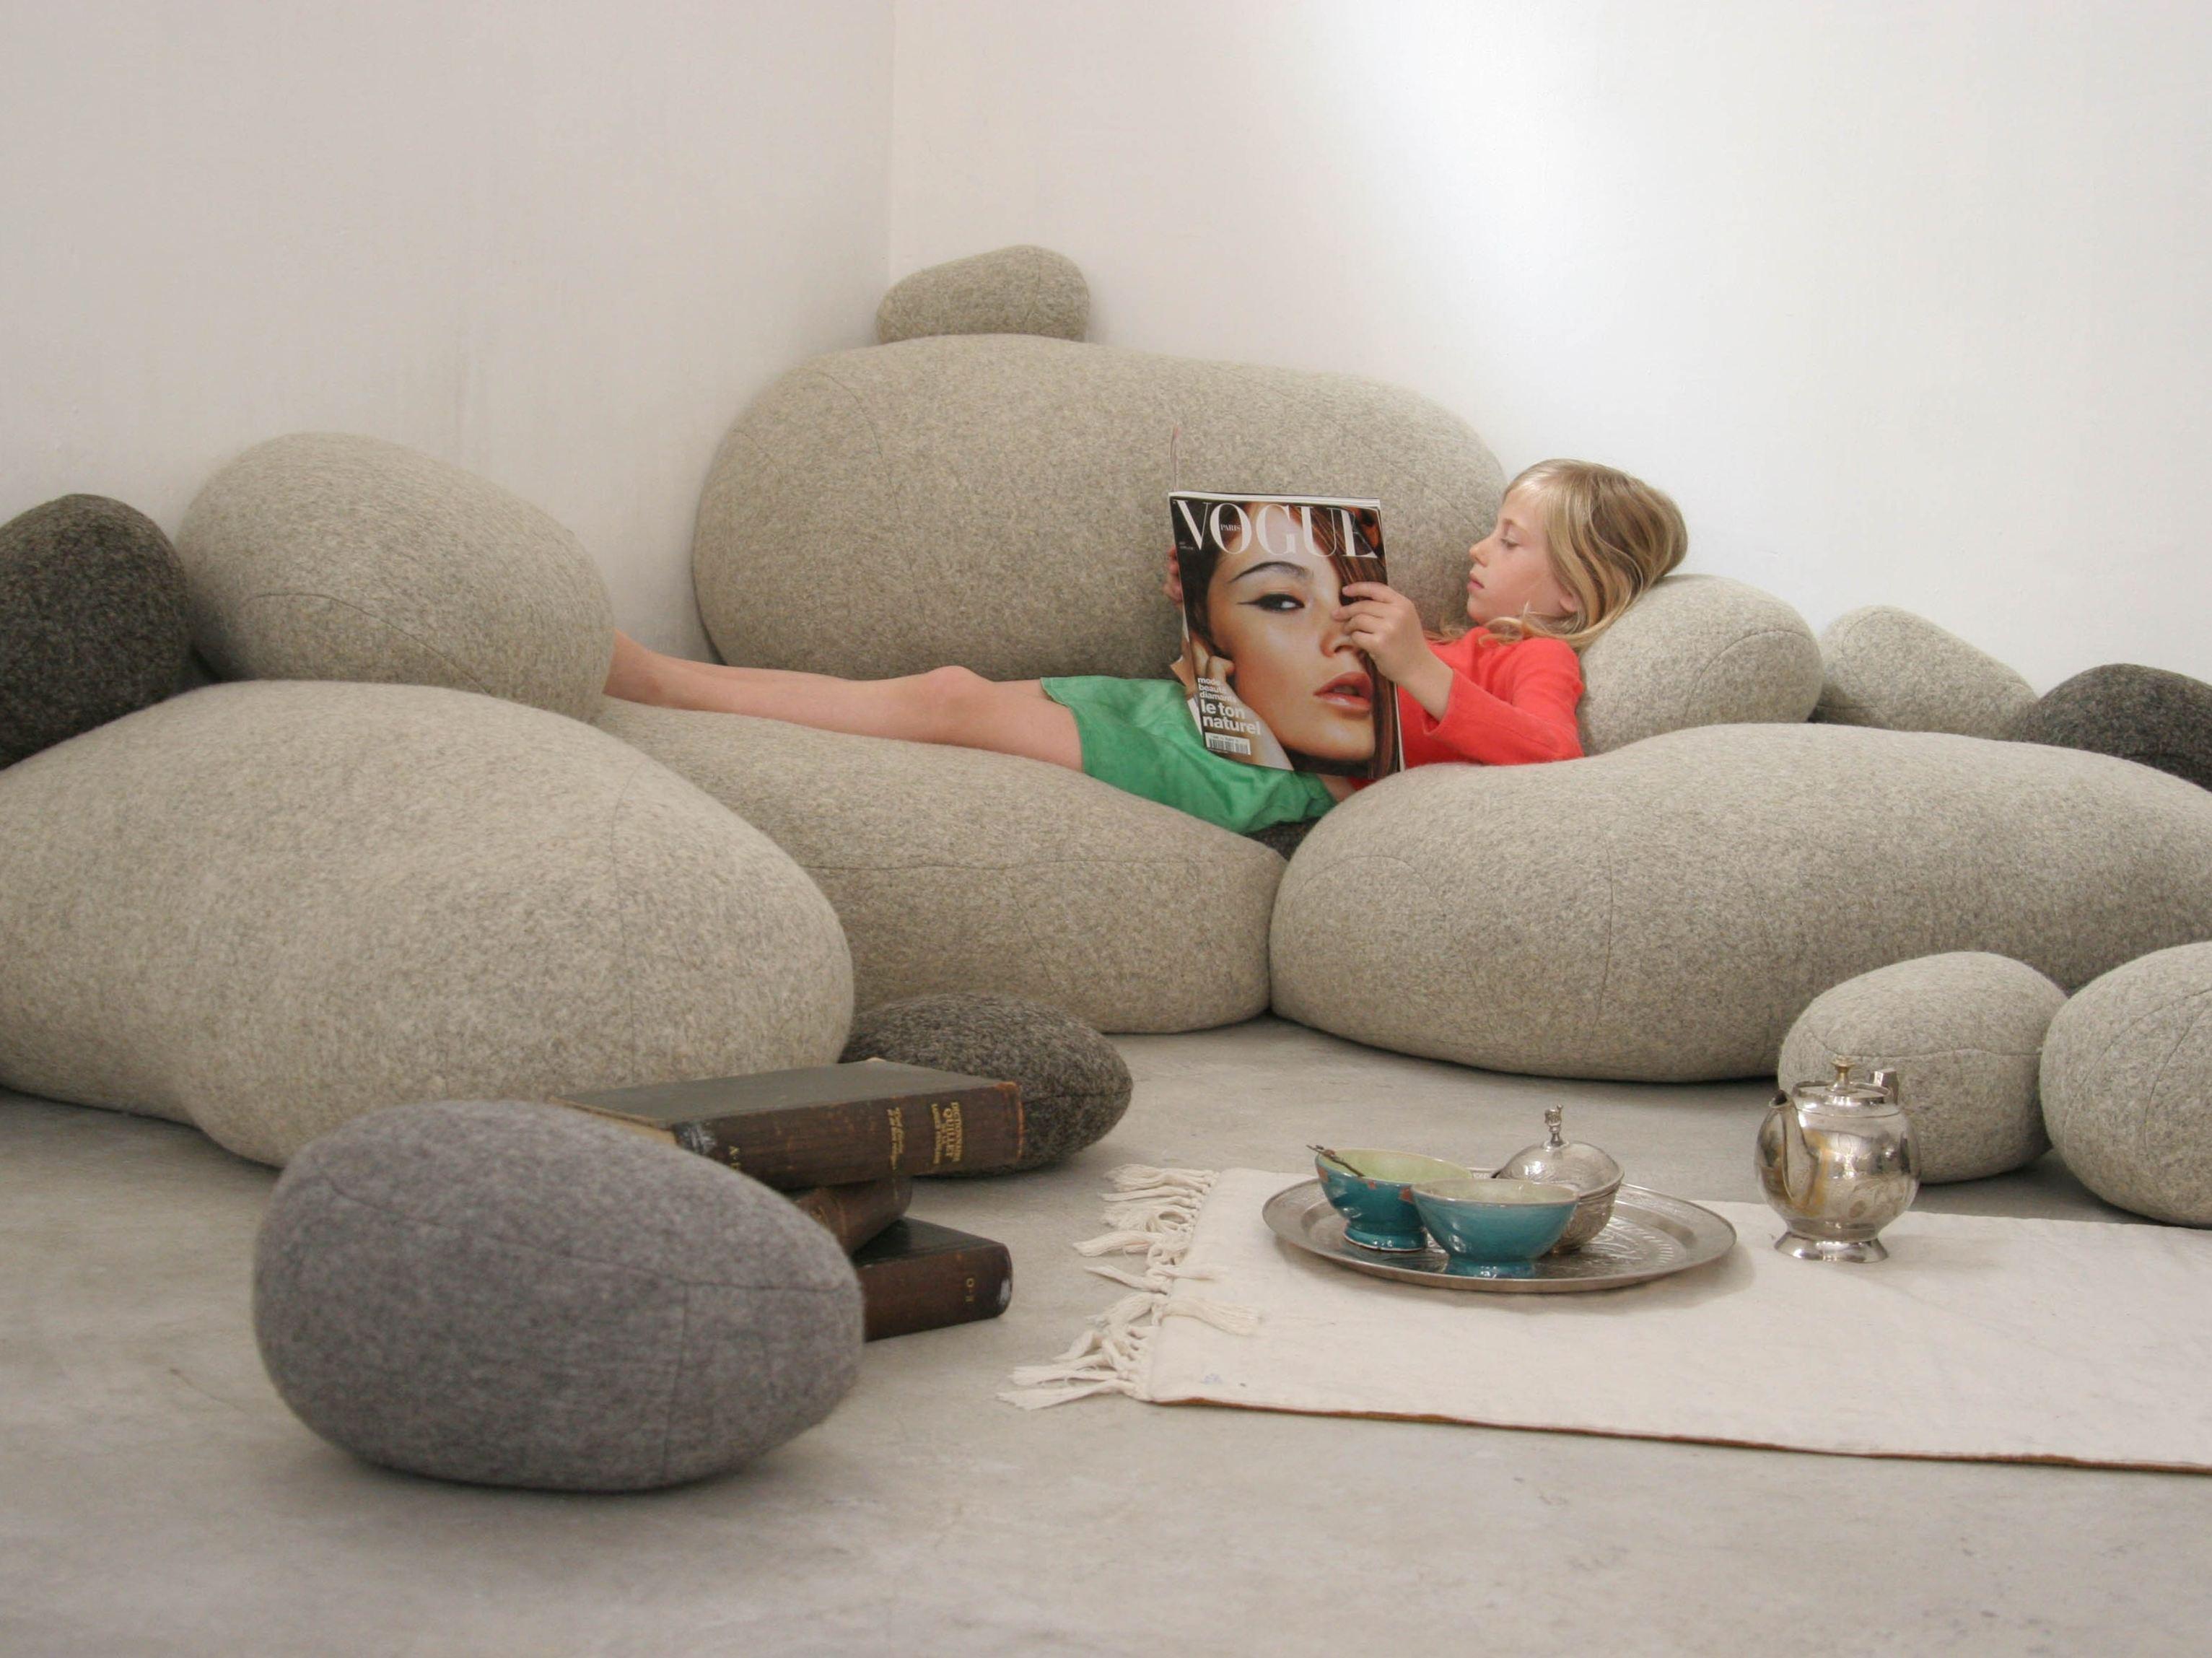 living-stones-pillow